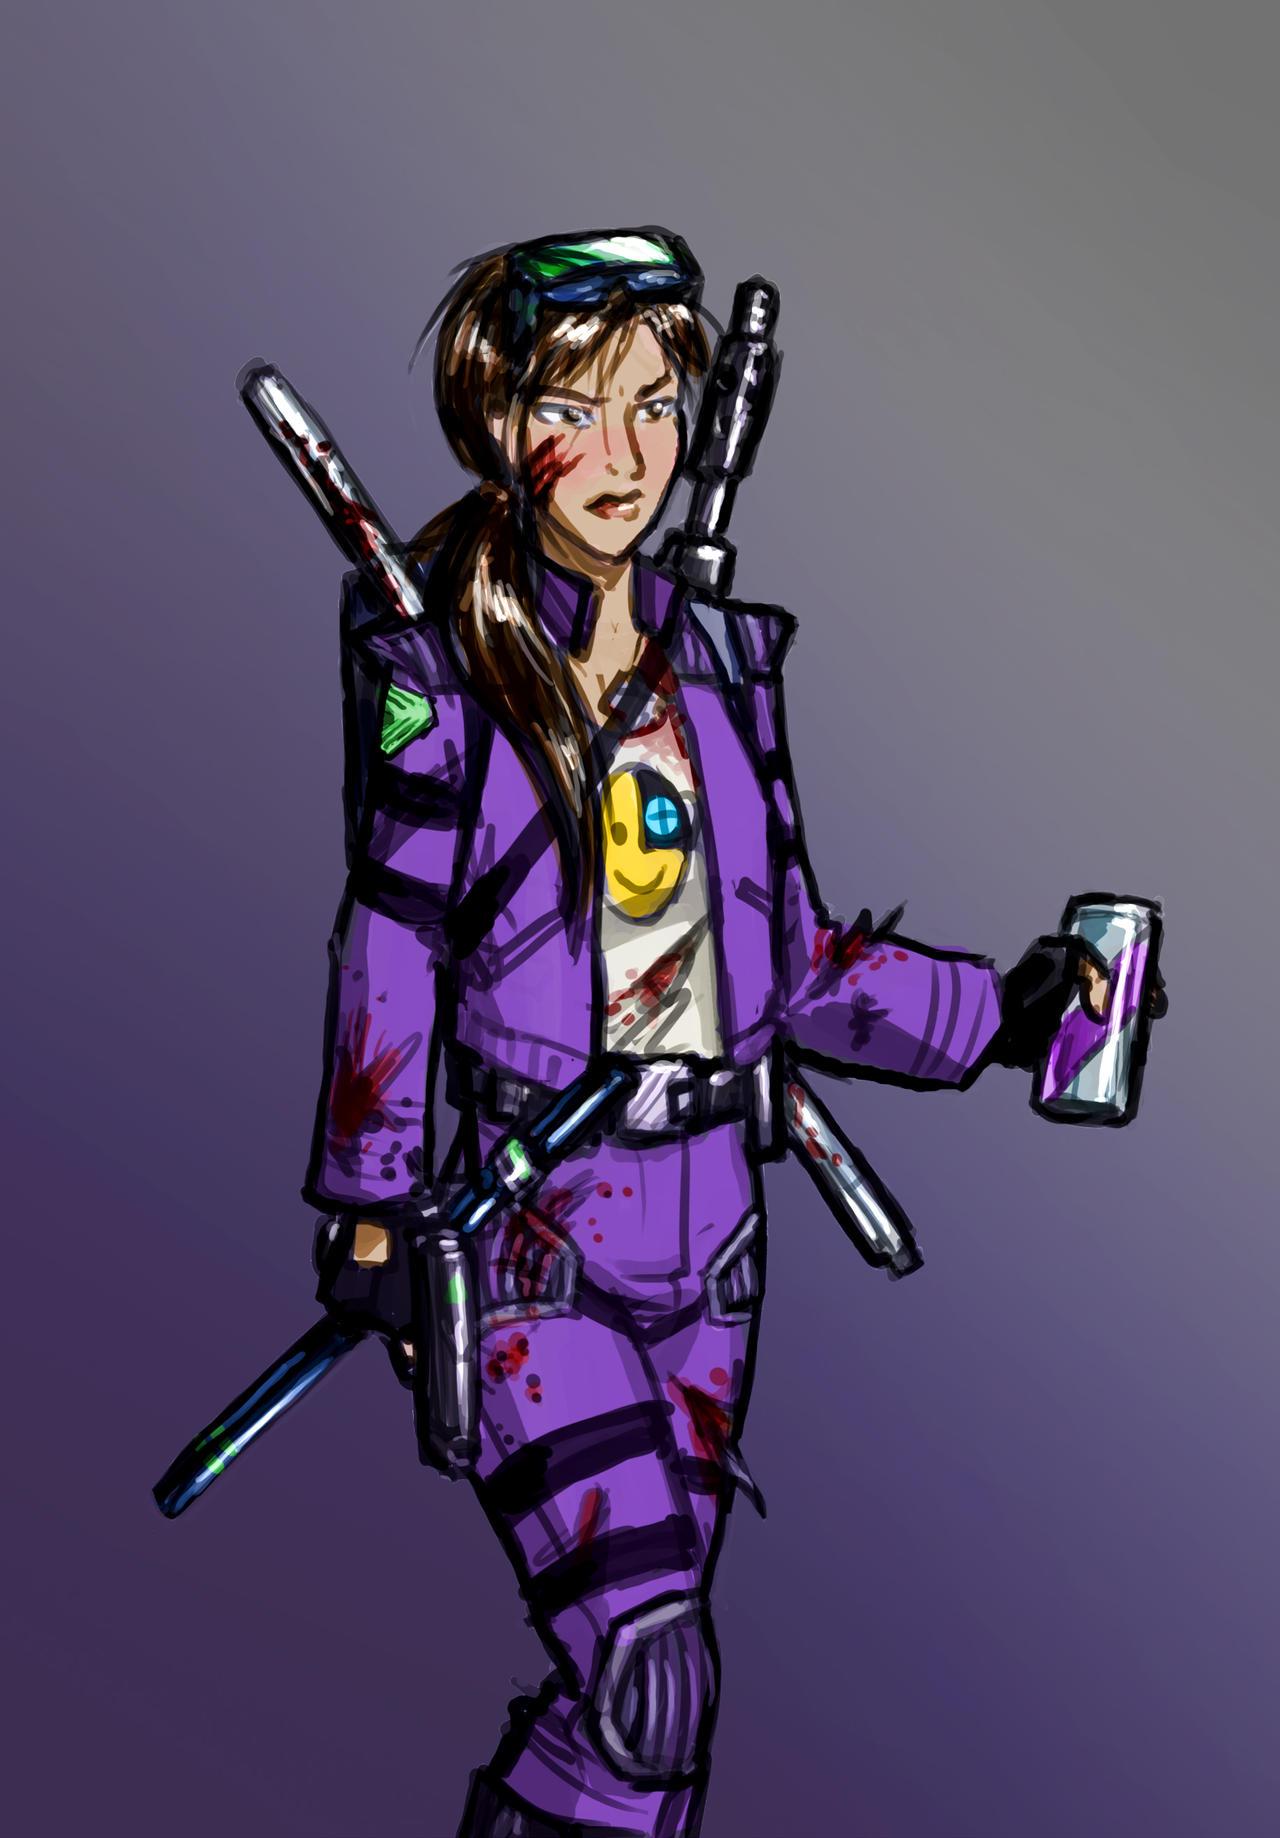 System Shock's Hacker - as a woman by DeepChrome